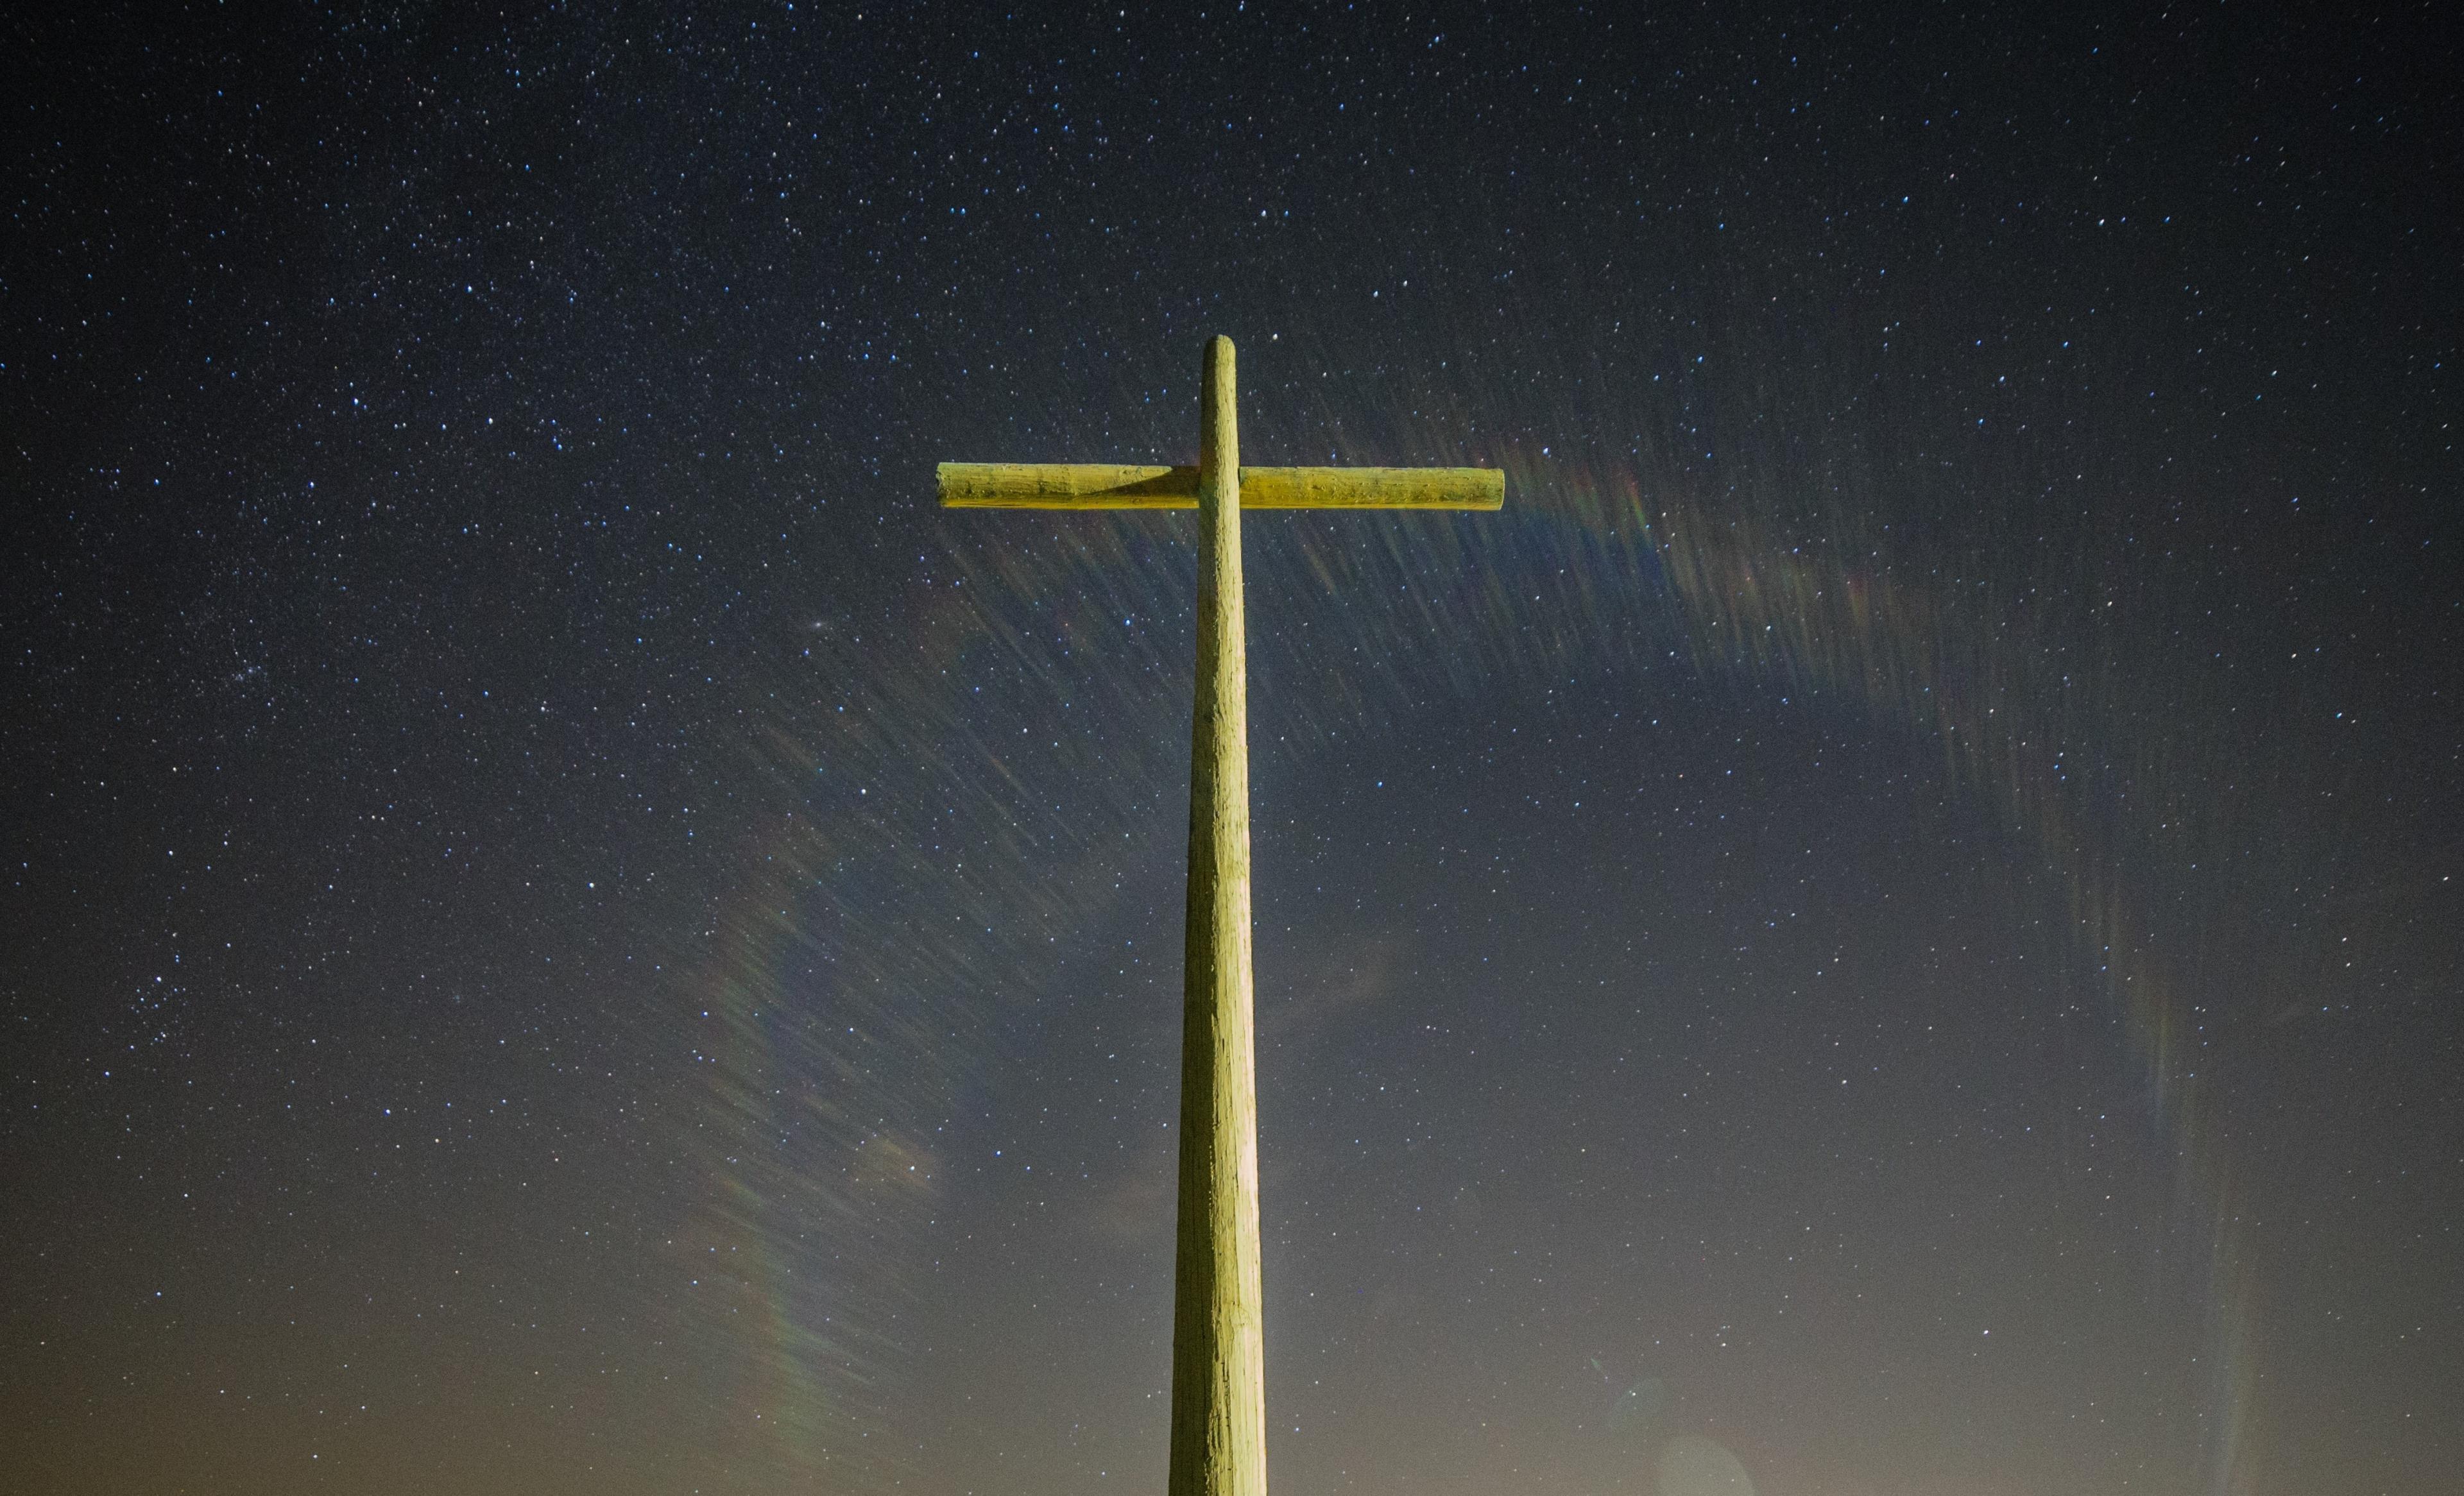 A stark cross against a starry night sky